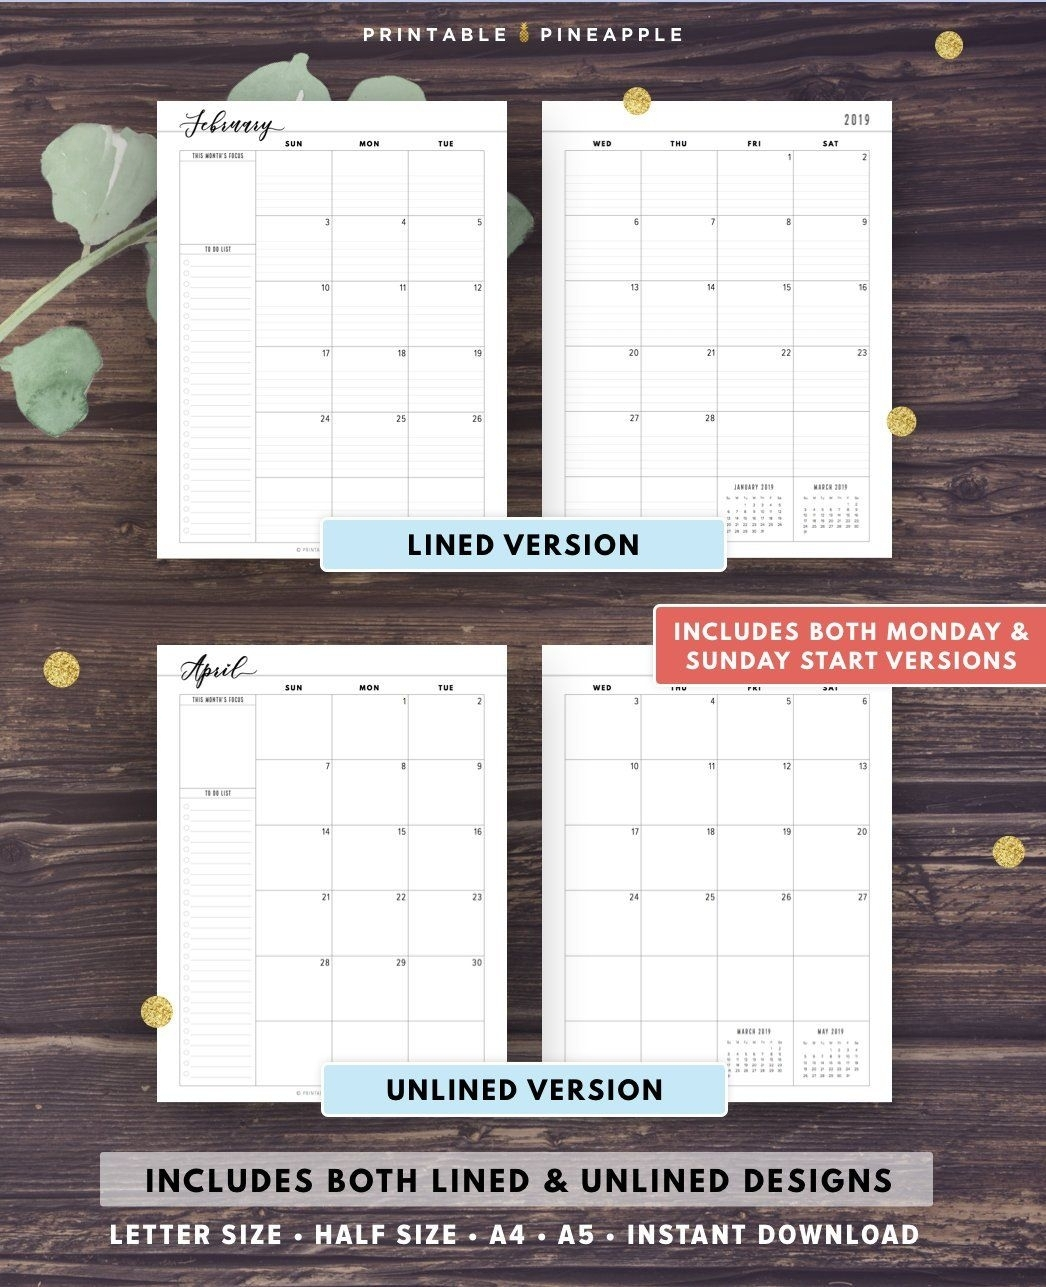 Take Free Half Page Customizable Calendar Printable | Calendar Printables Free Blank